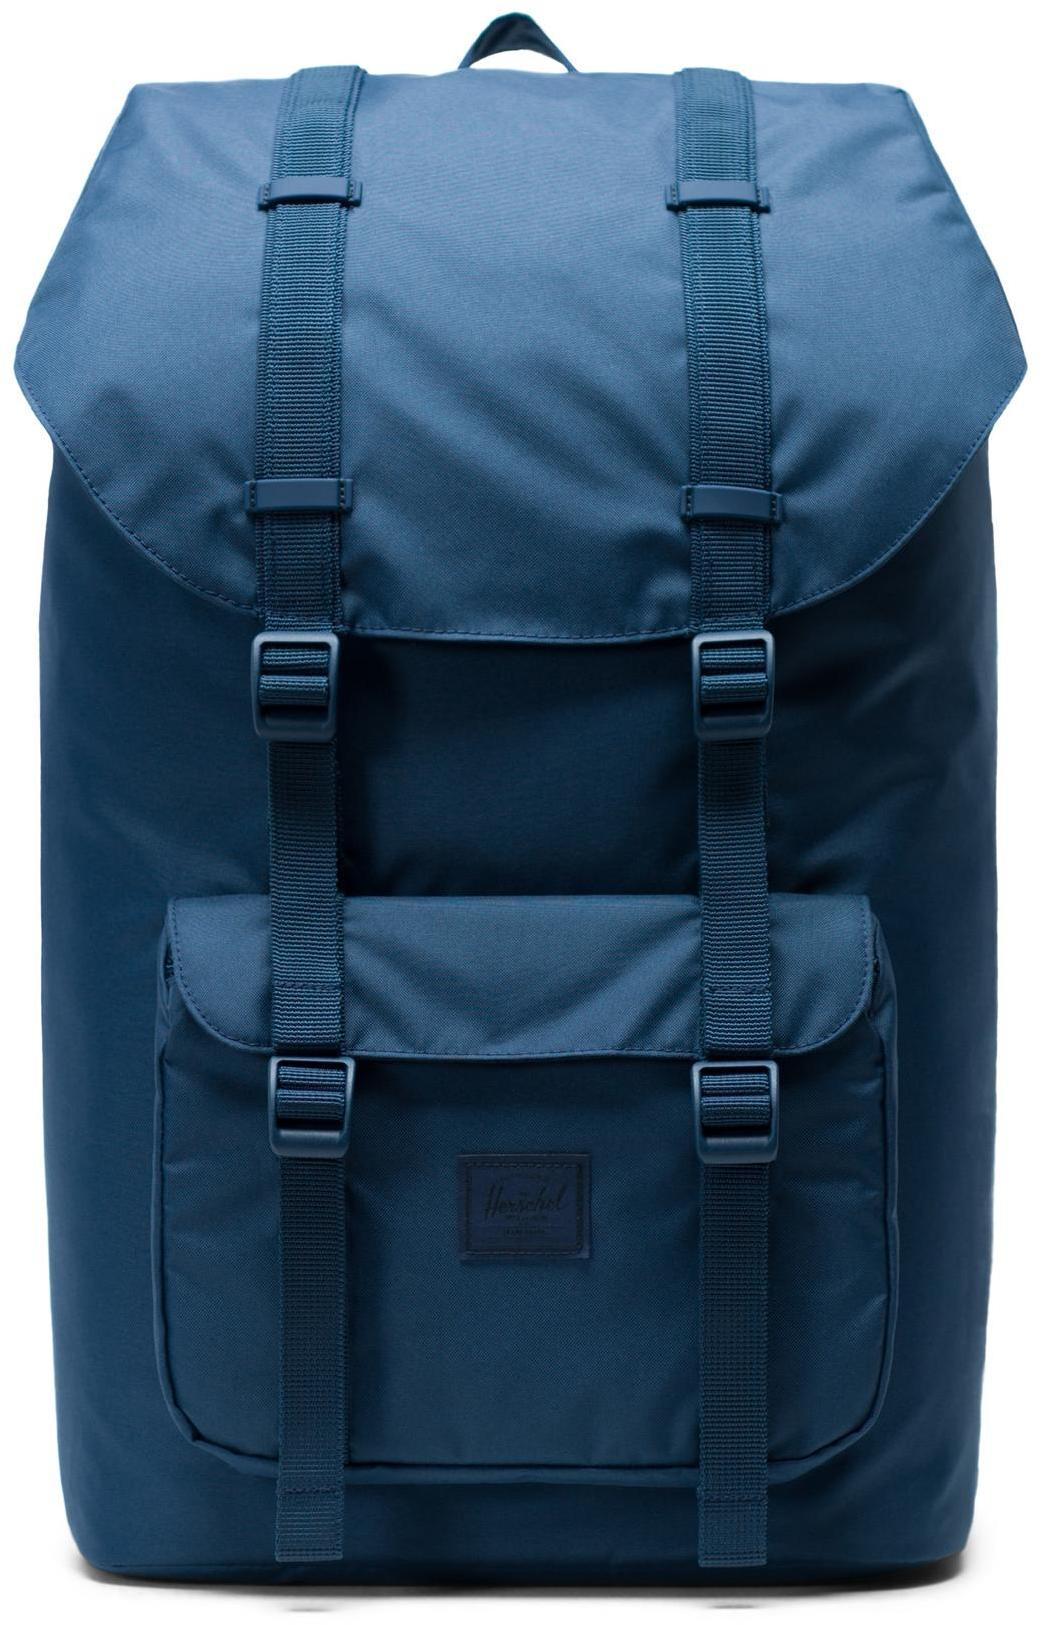 Herschel Little America Light Rygsæk, saddle brown | Travel bags